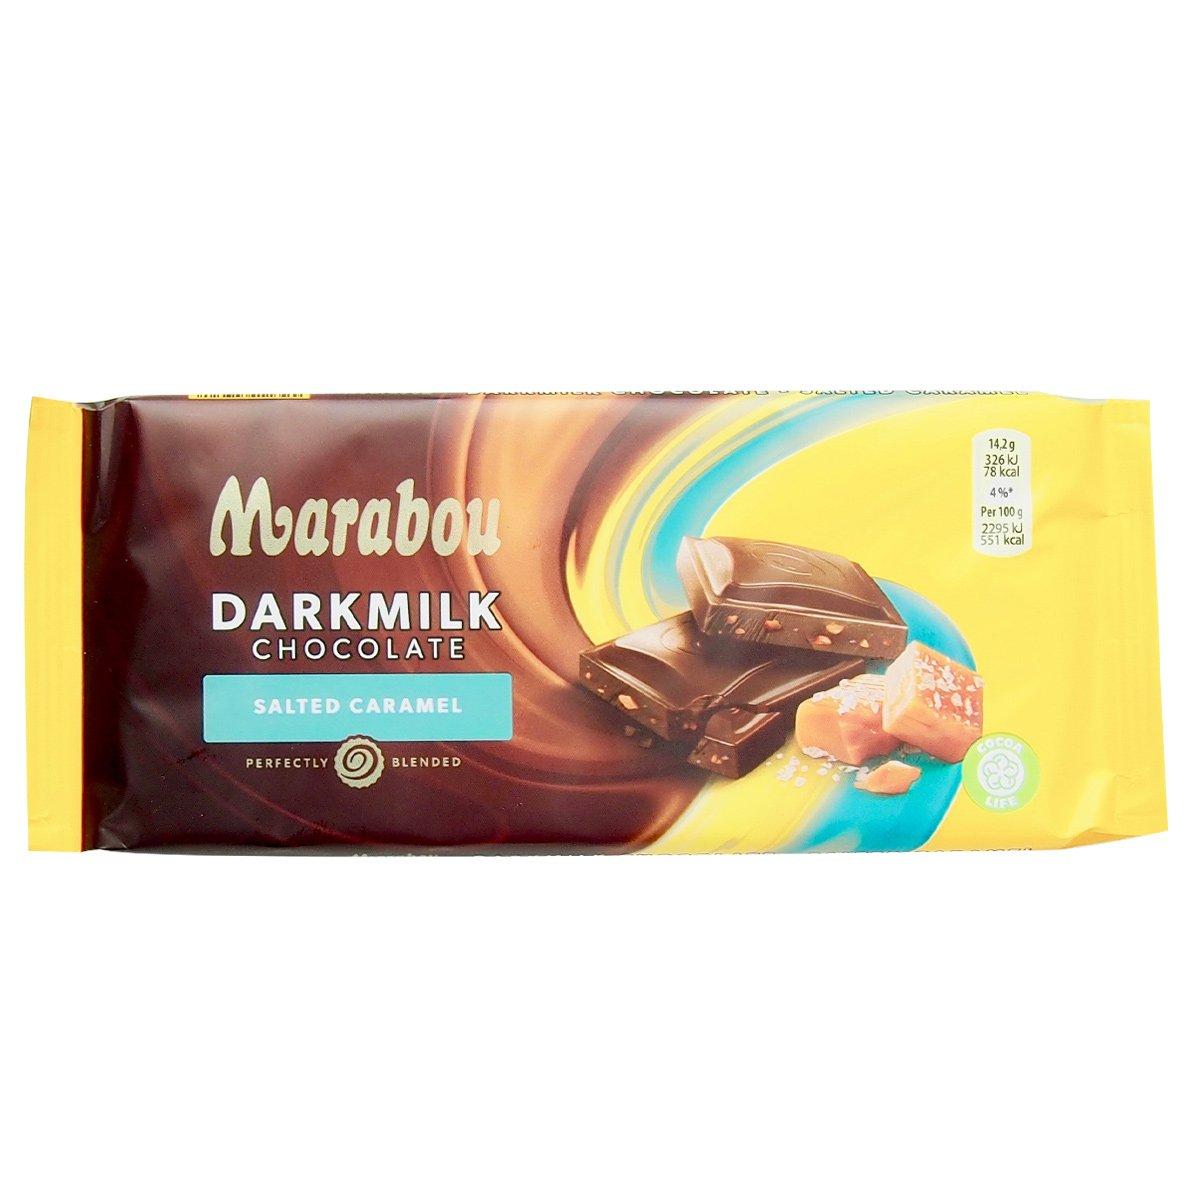 Marabou Darkmilk salted caramel (85g) 1